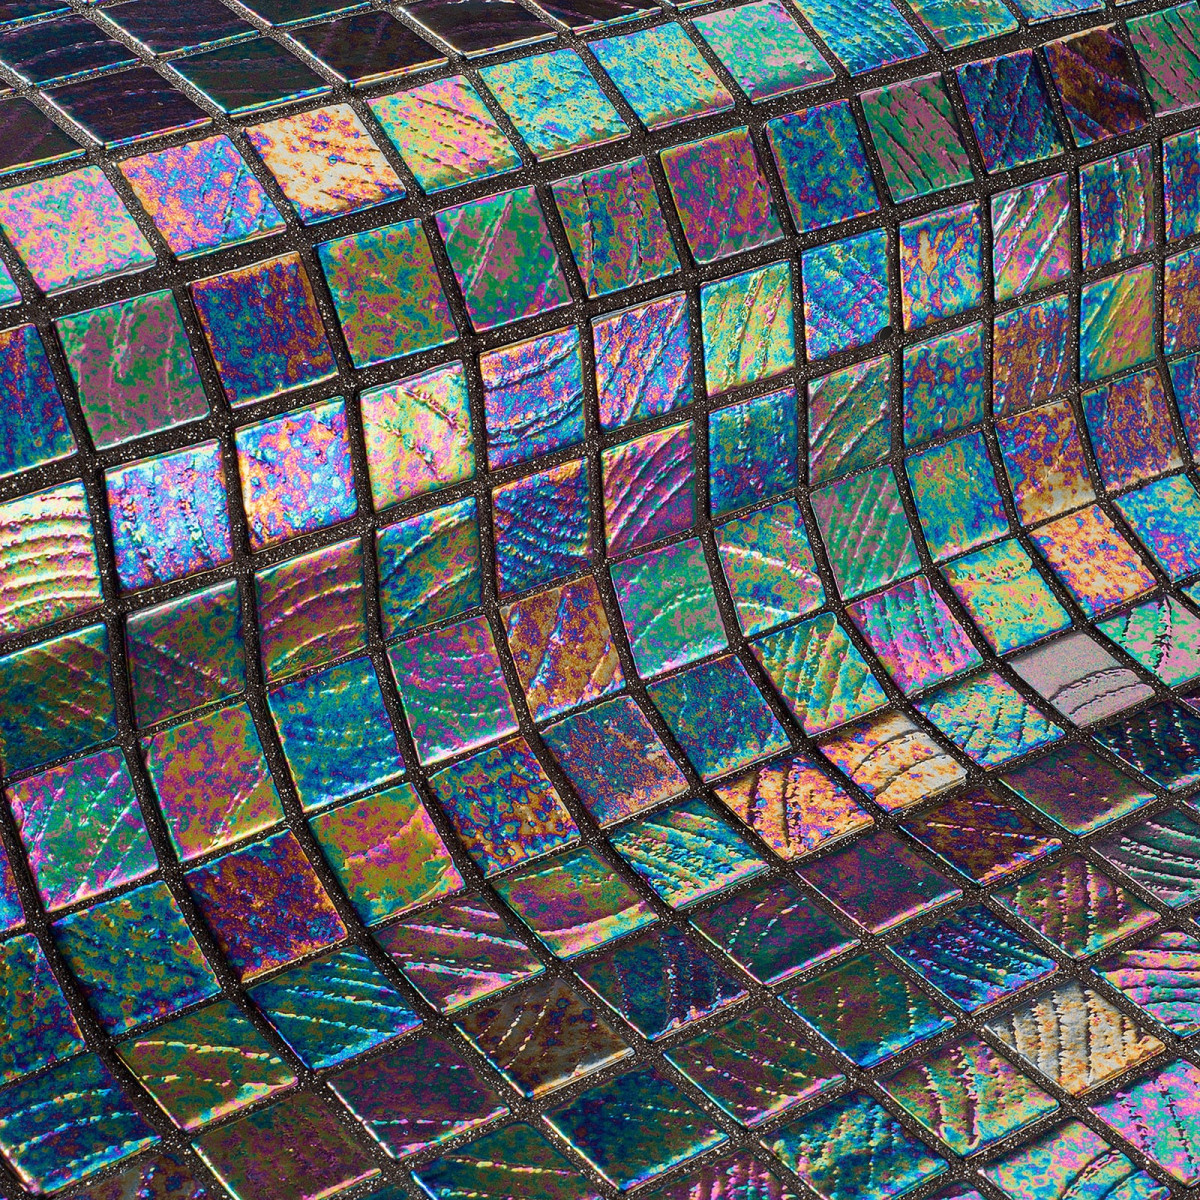 букет мозаика разная картинки клуб, объединяющий прекрасную